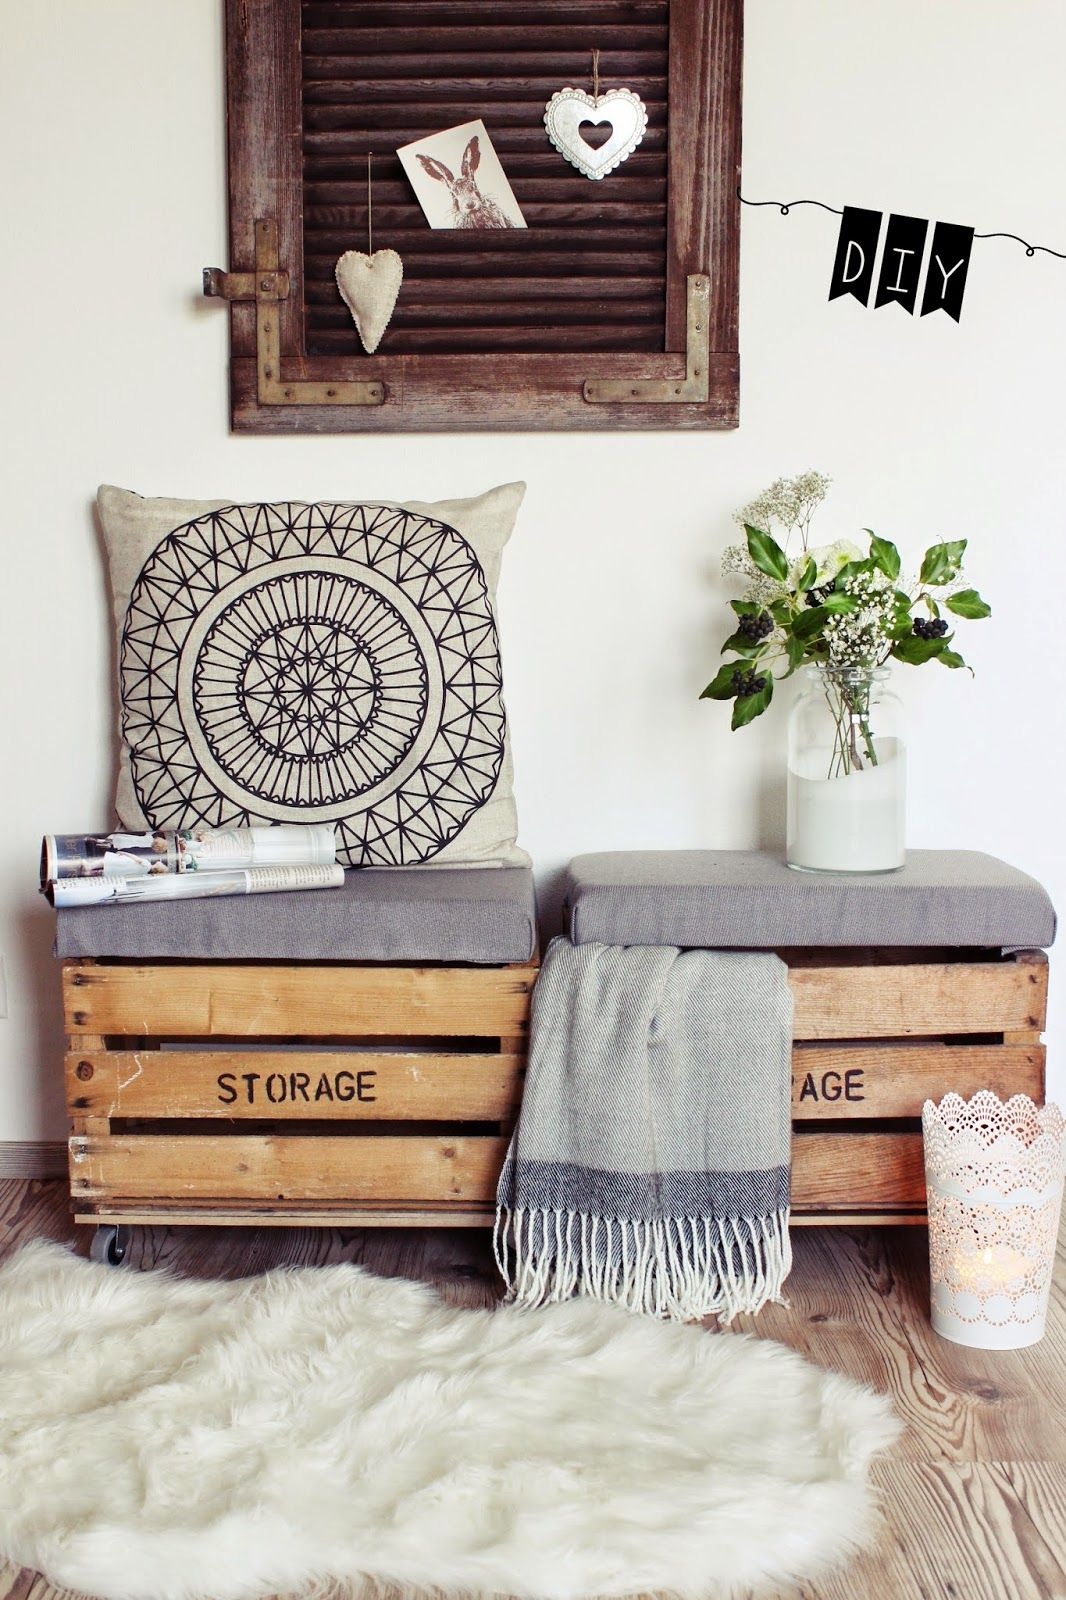 die besten 25 sitztruhe wei ideen auf pinterest ikea. Black Bedroom Furniture Sets. Home Design Ideas